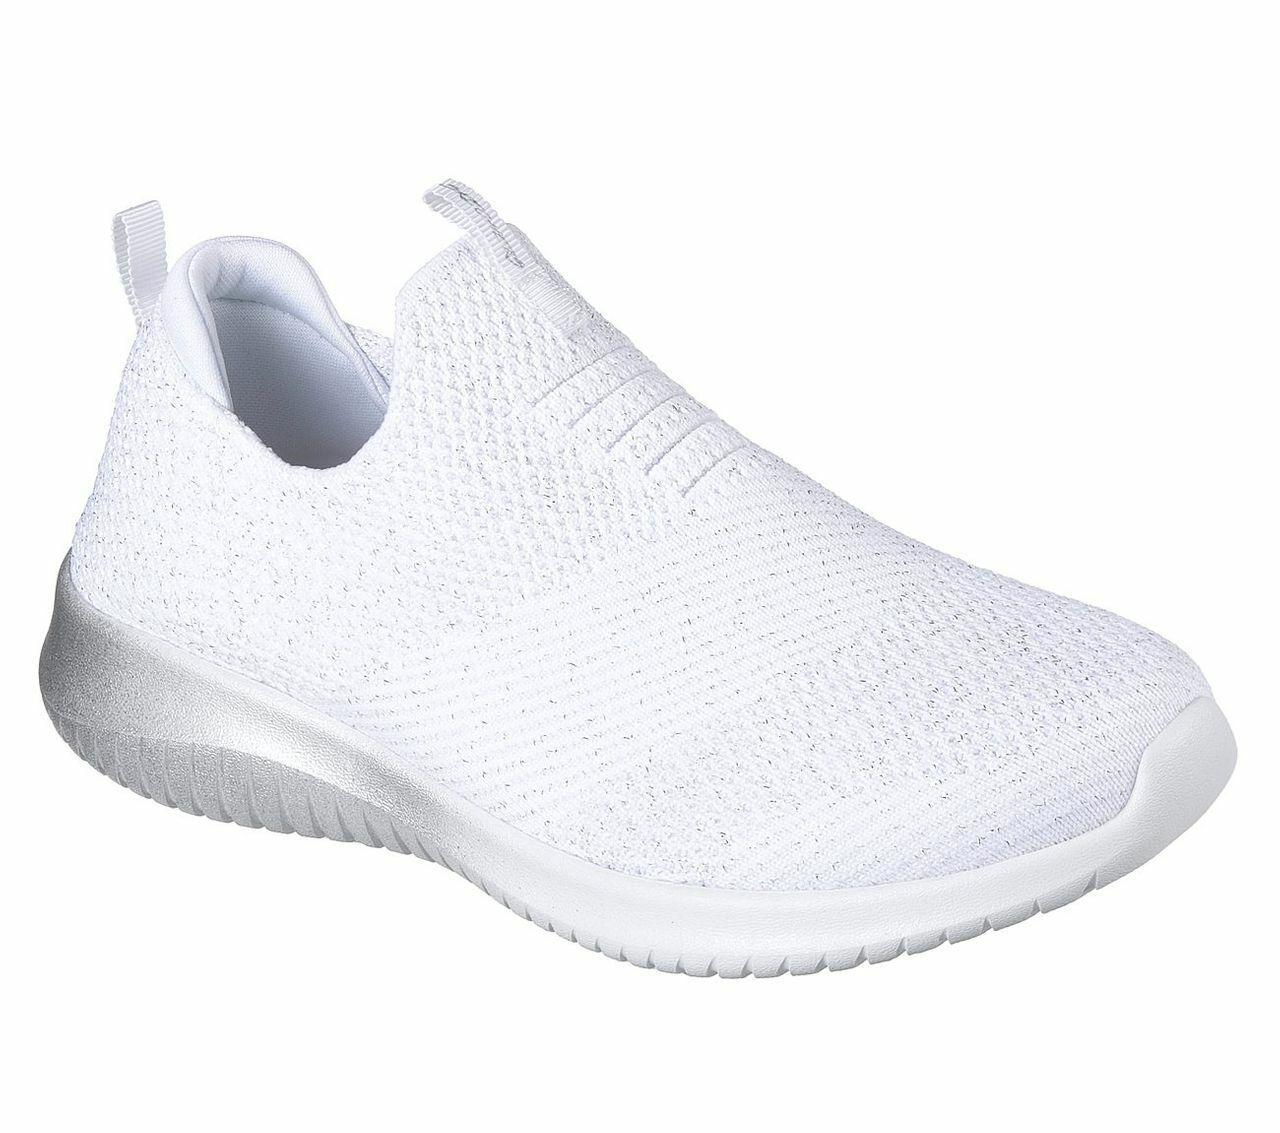 Skechers Sport damen ULTRA FLEX METAMORPHIC Turnschuhe Damen Schuhe Weiß